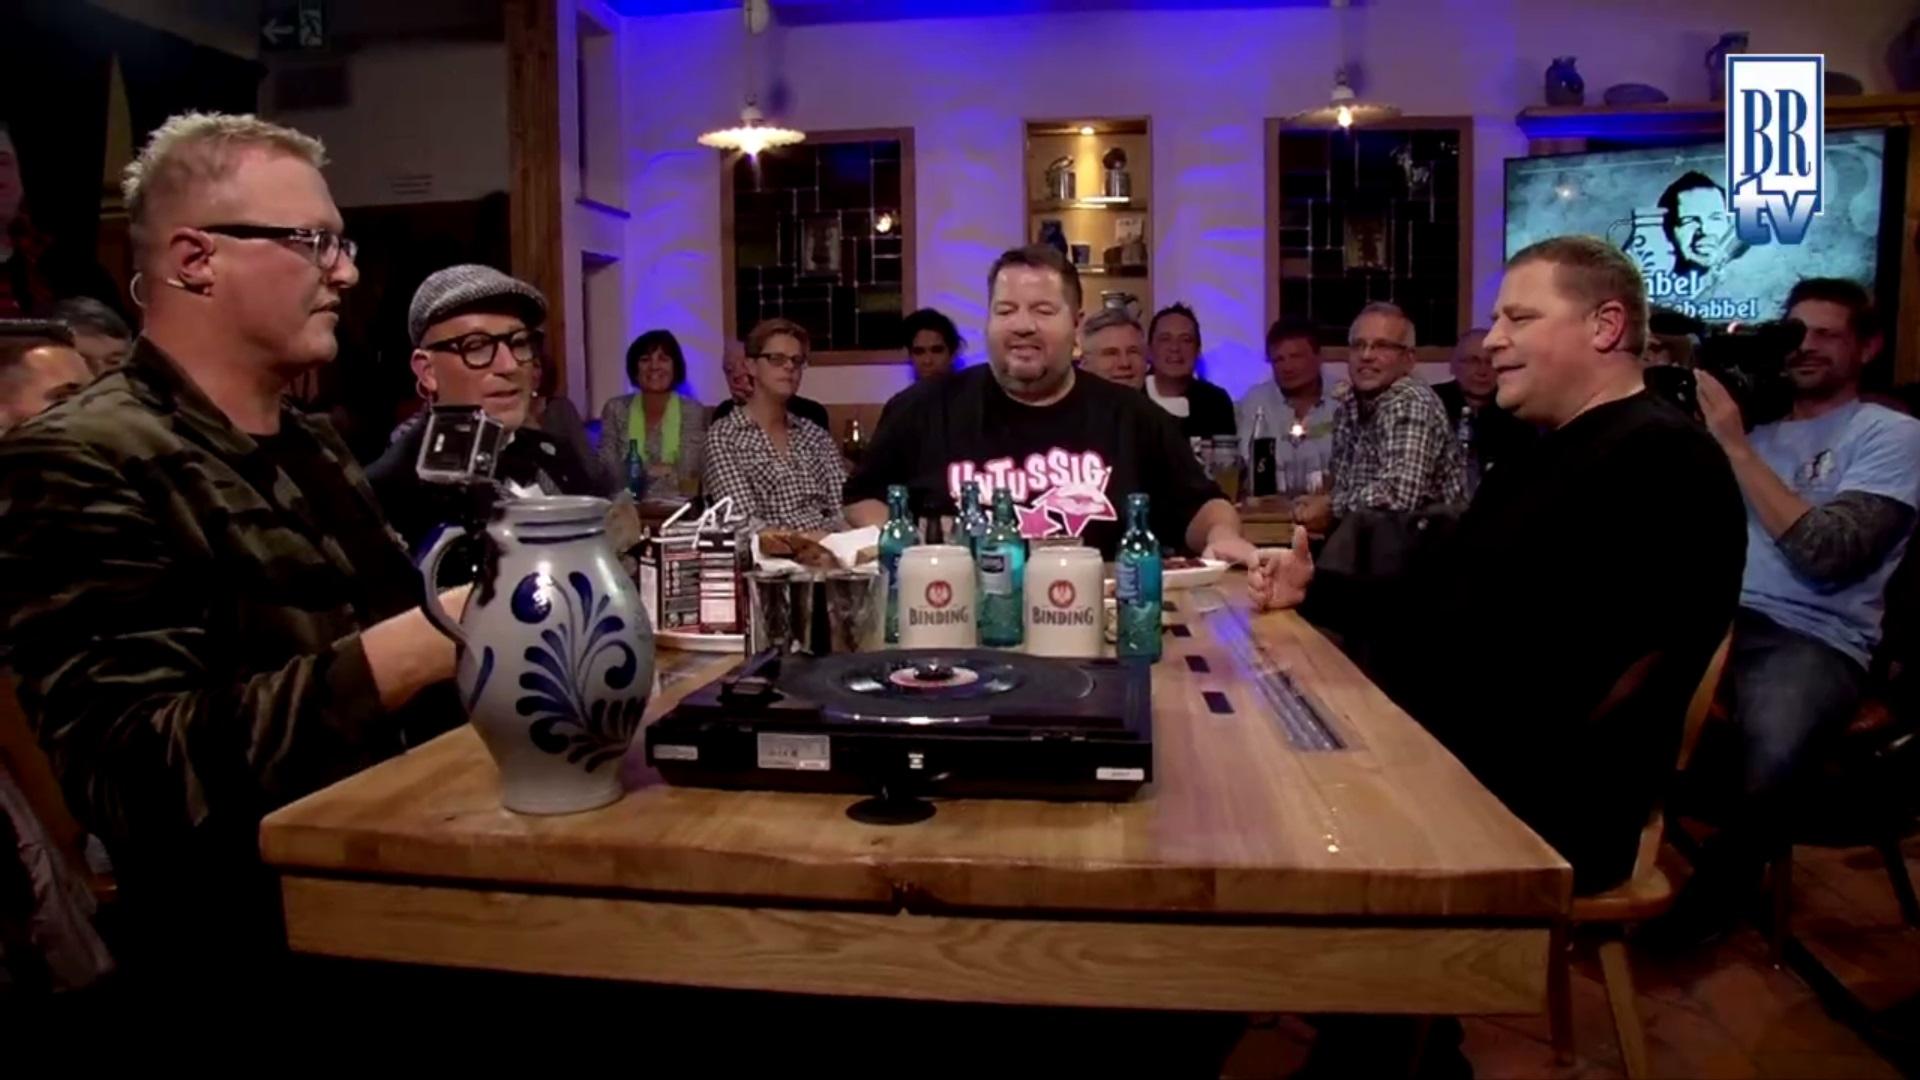 Bembel & Gebabbel – Folge 29 mit Max Eberl, Thomas Rath & Lars Obendorferb